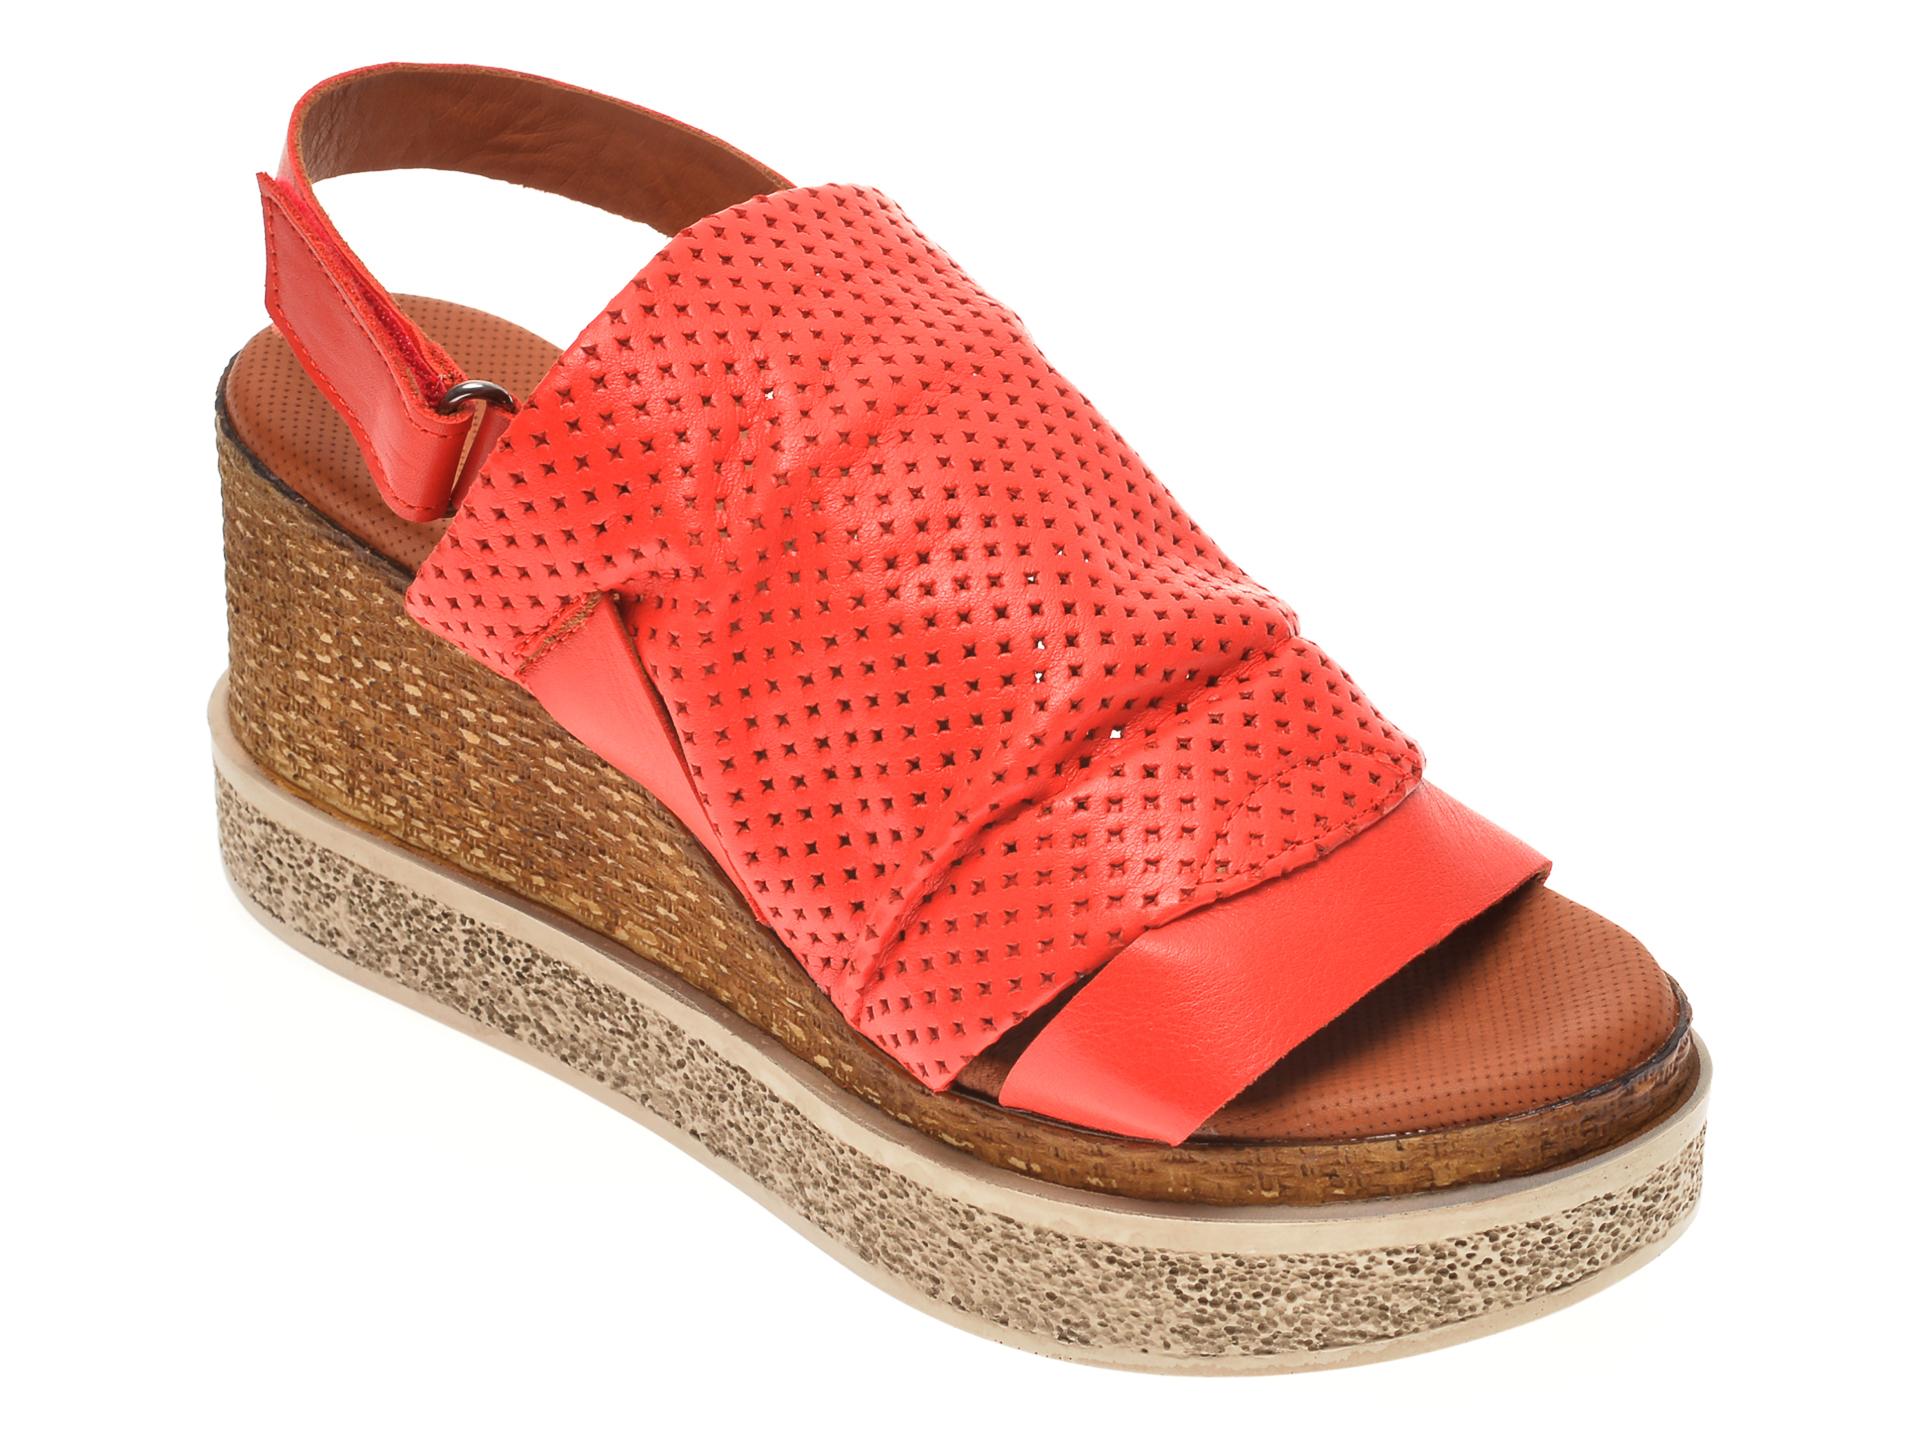 Sandale BABOOS rosii, 852507, din piele naturala